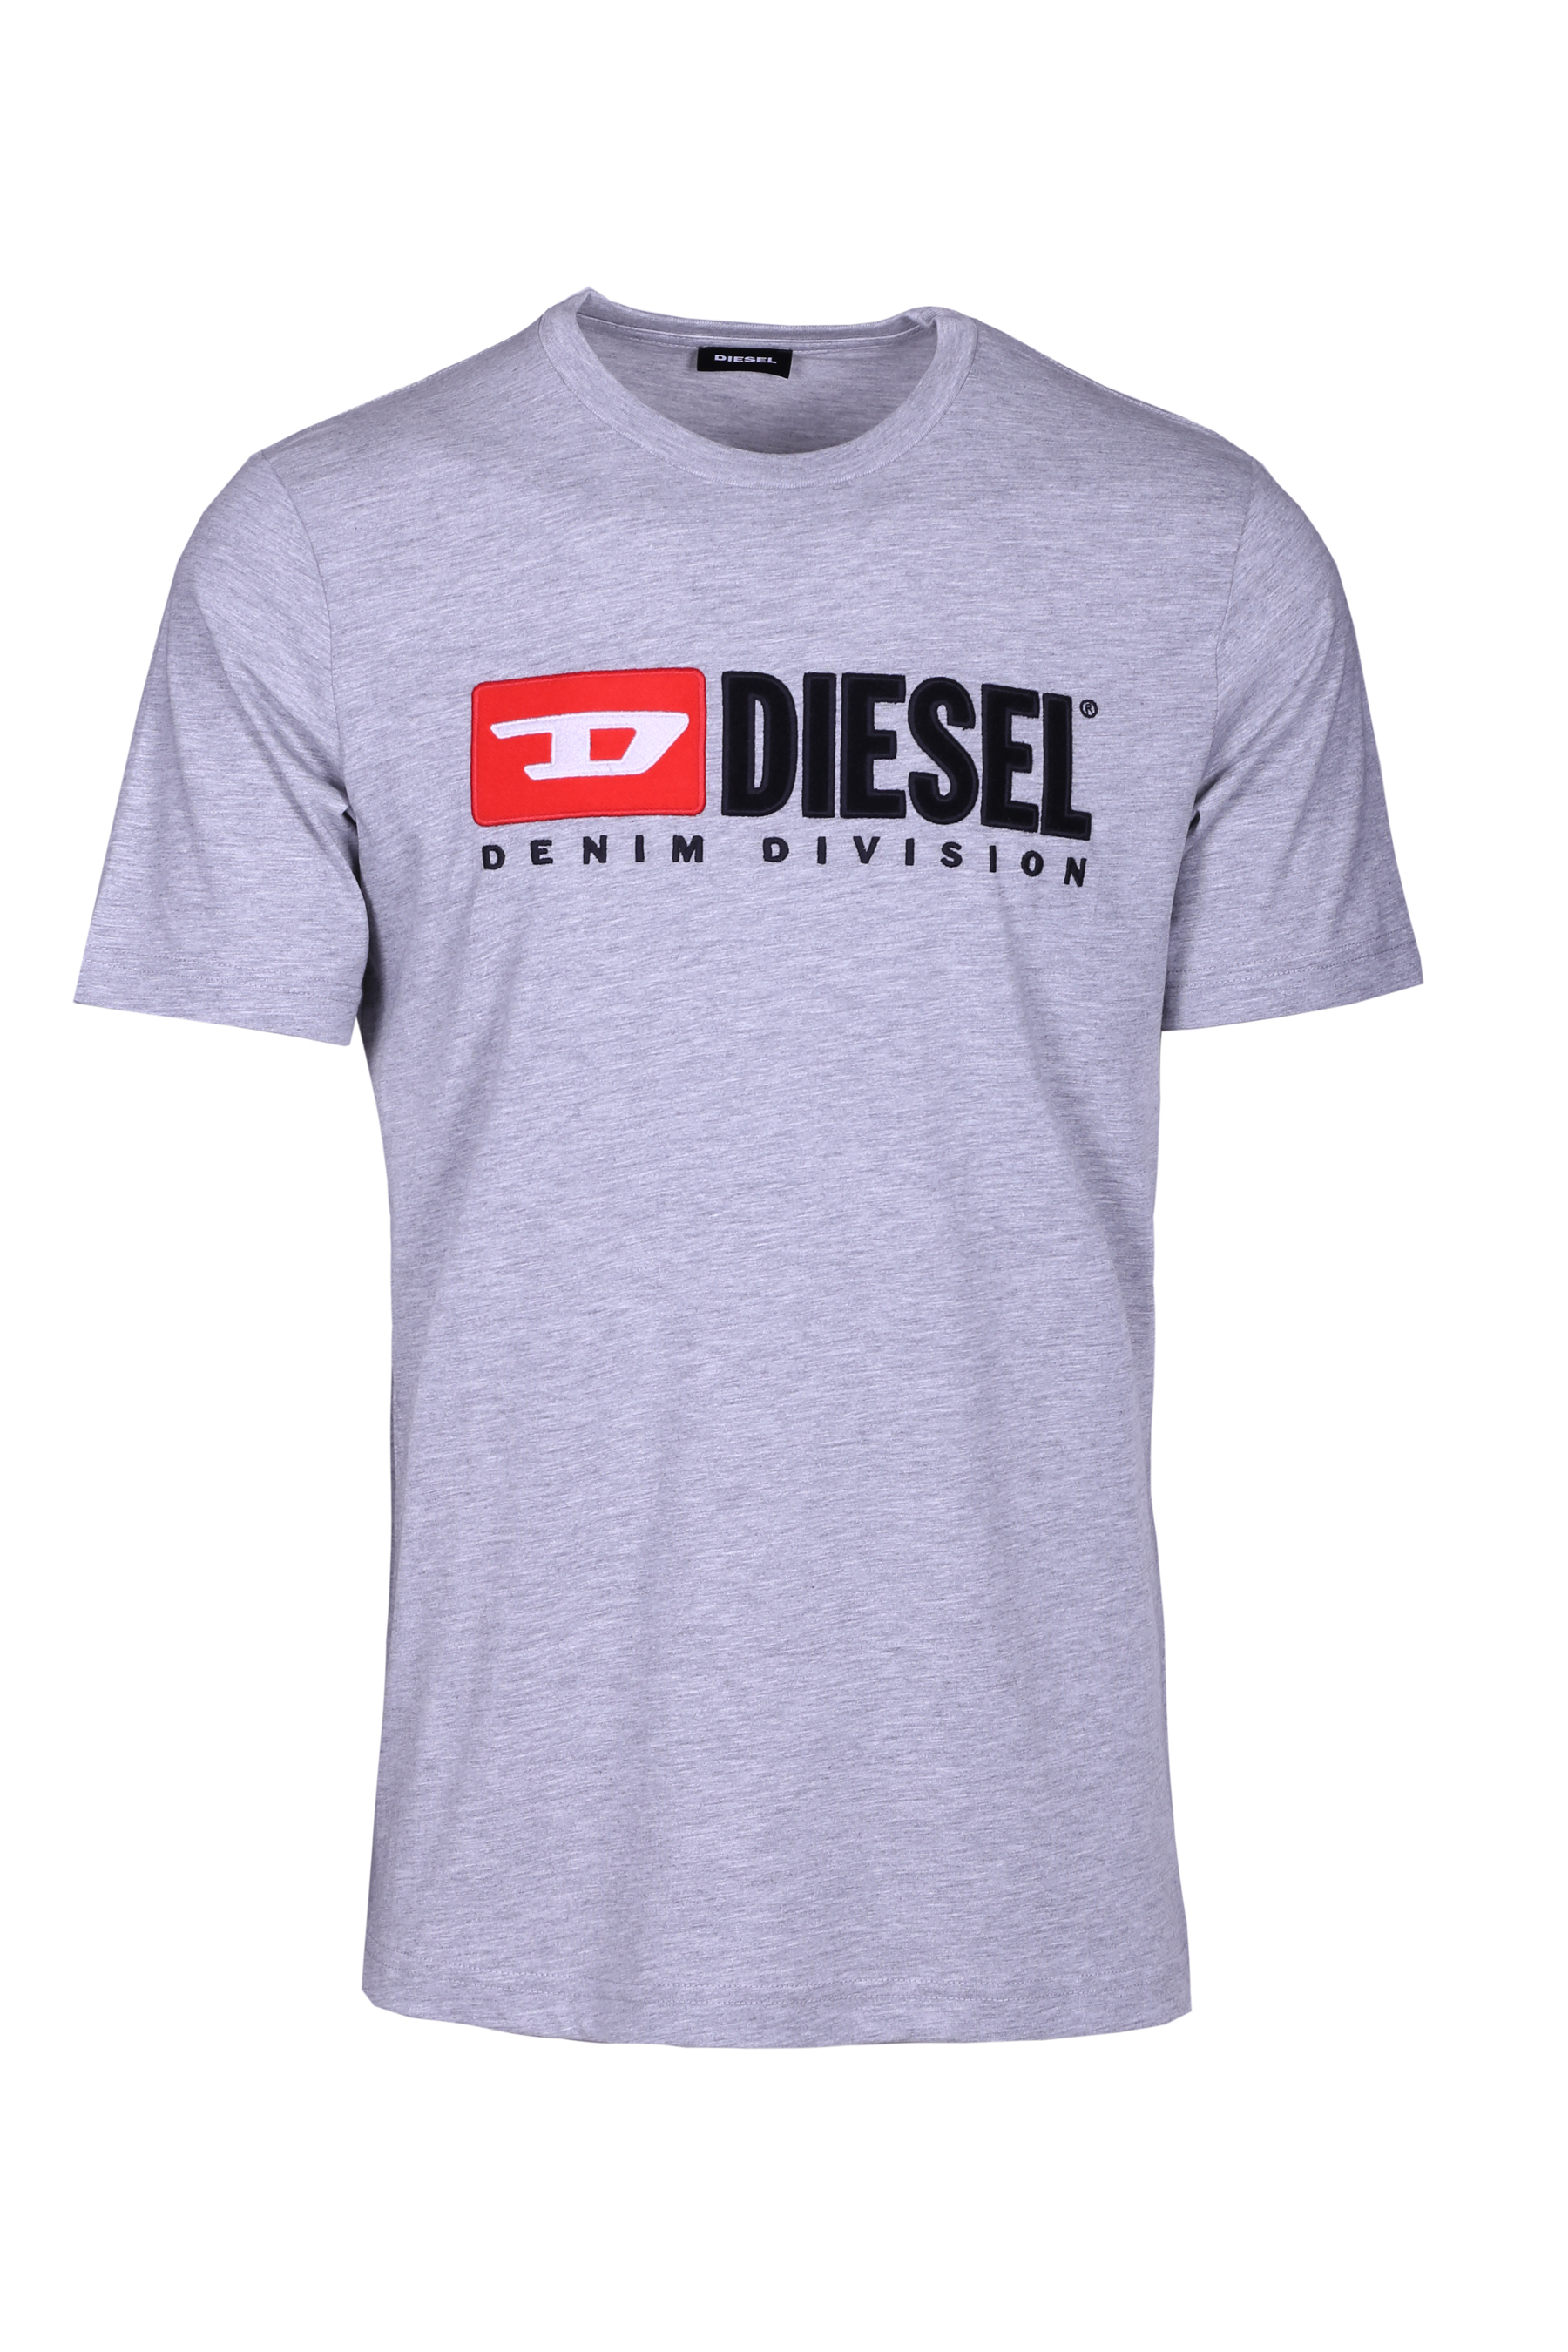 T-Shirt t-just-division. Diesel DIESEL |  | 00SH01 0CATJ912